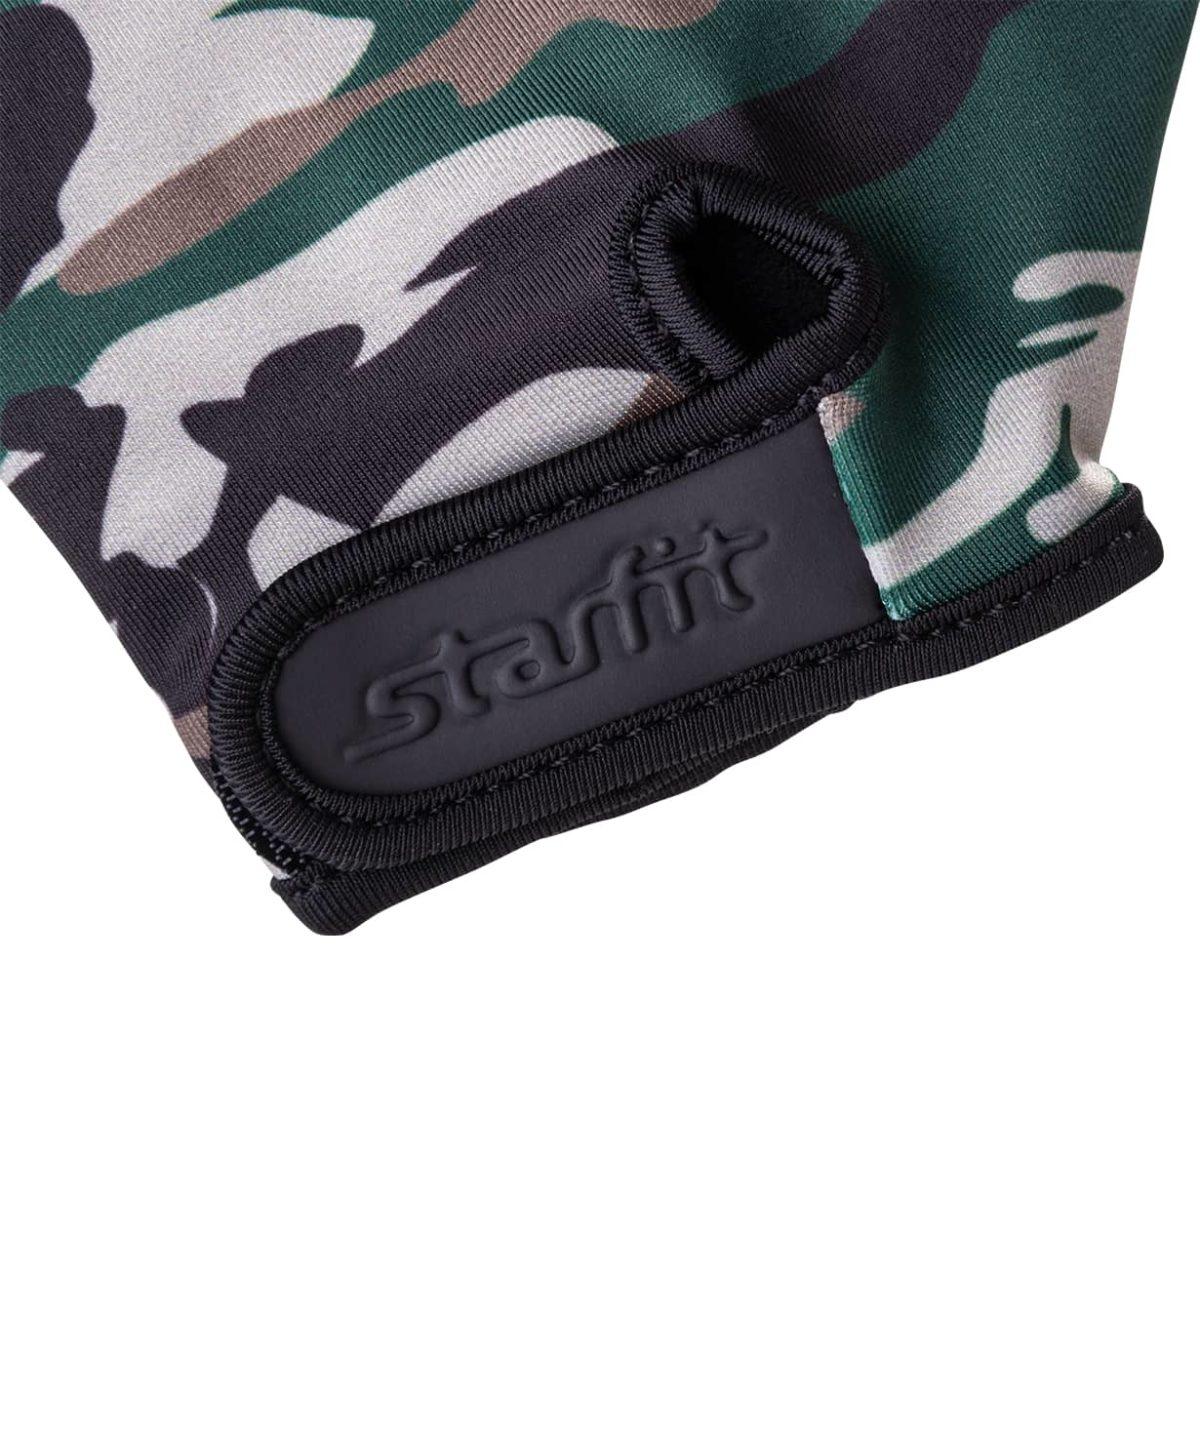 STARFIT перчатки д/фитнеса  SU-126: хаки - 4